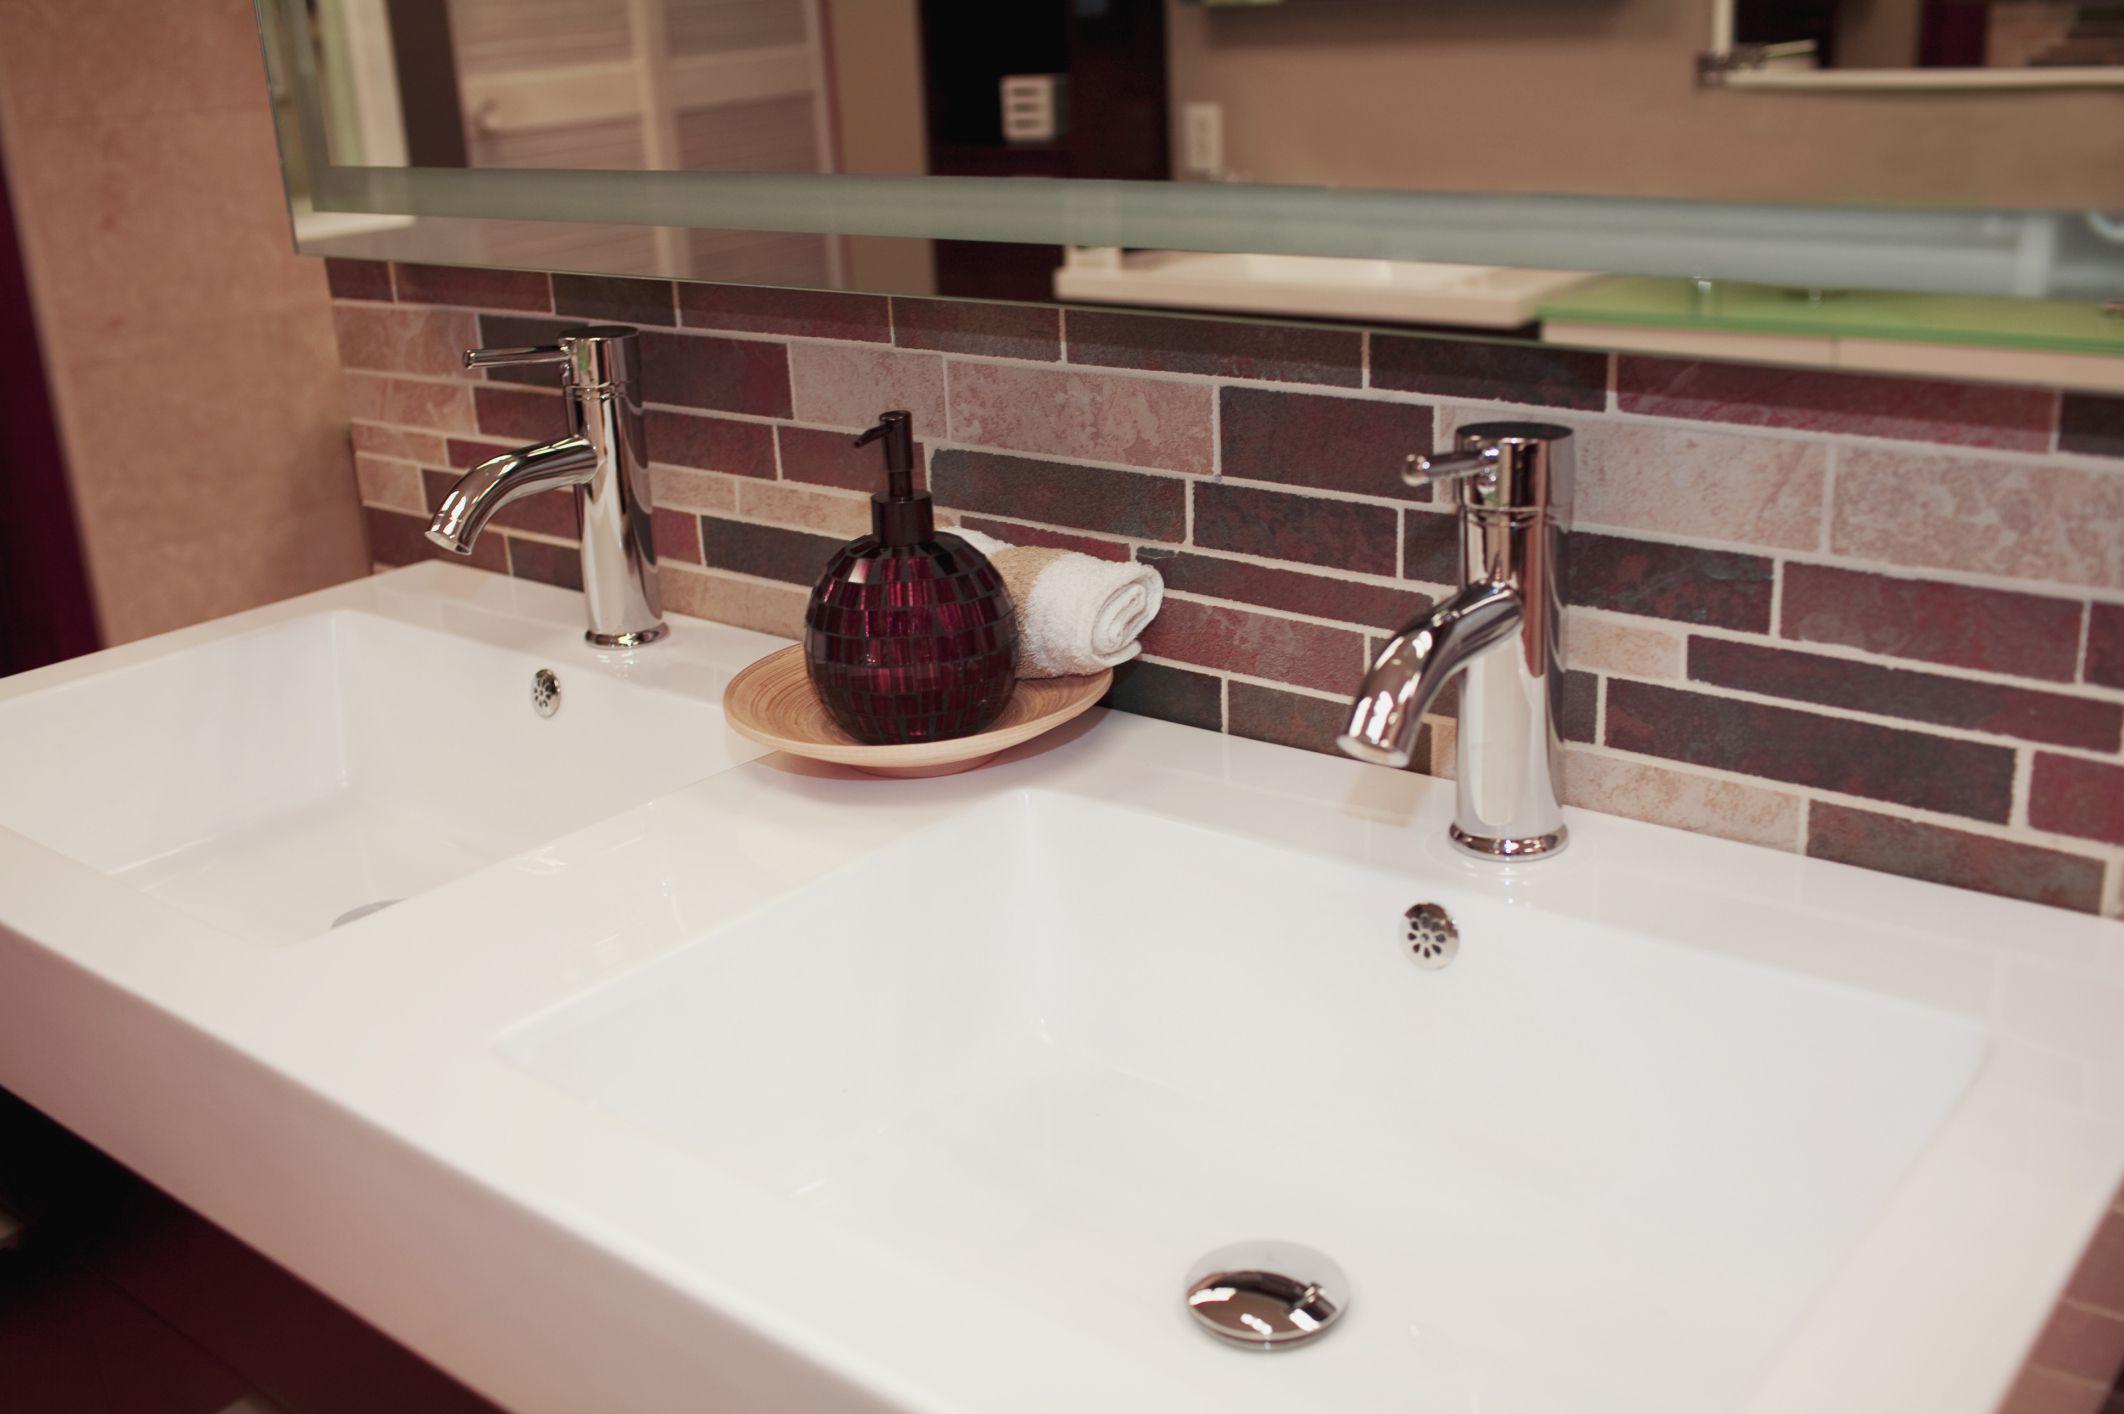 Bathroom sink and counter - Bathroom Sink And Counter 37